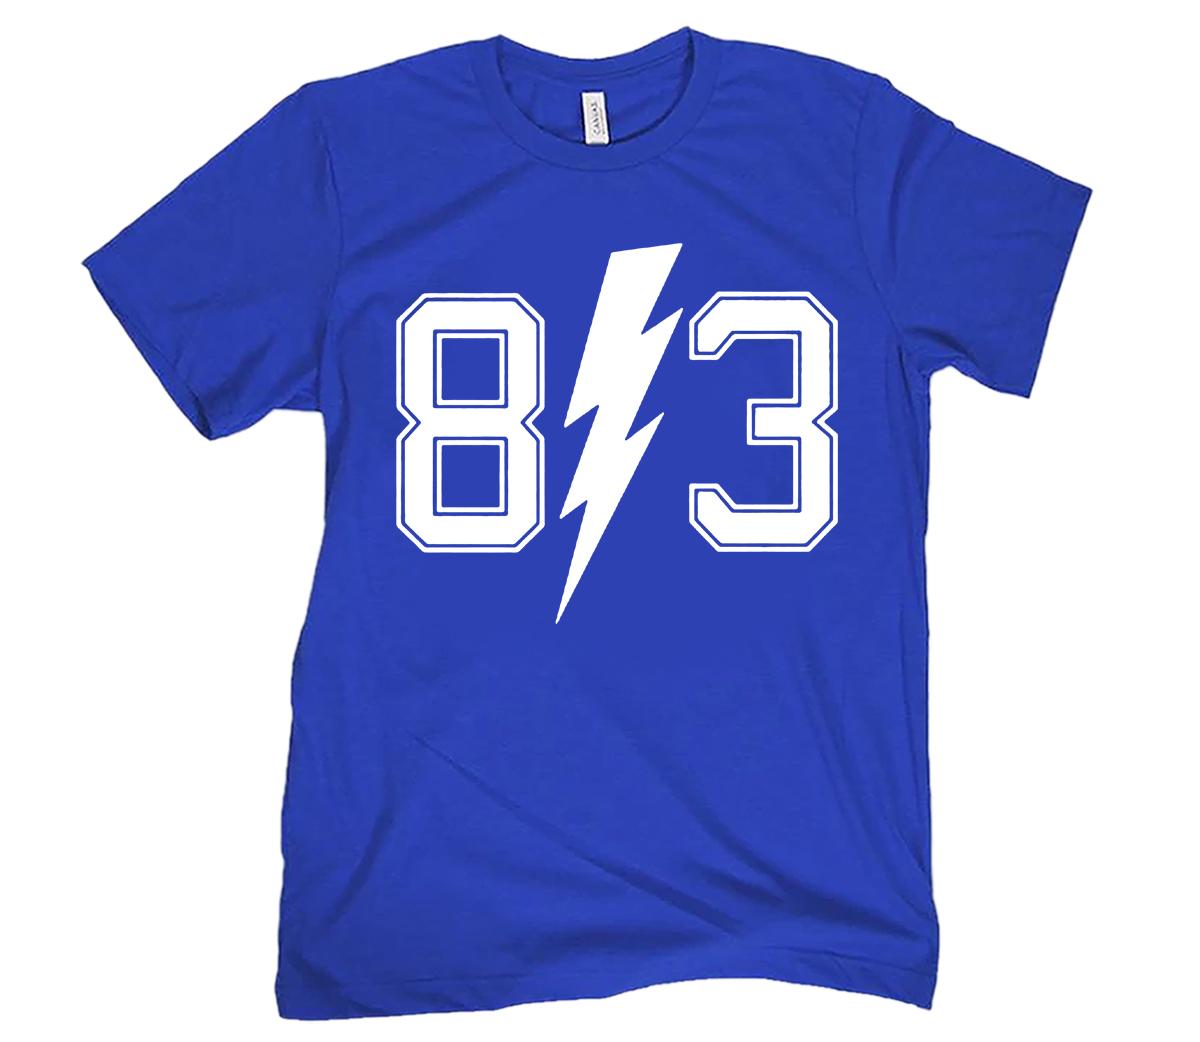 Spittin' Chiclets 813 Shirt